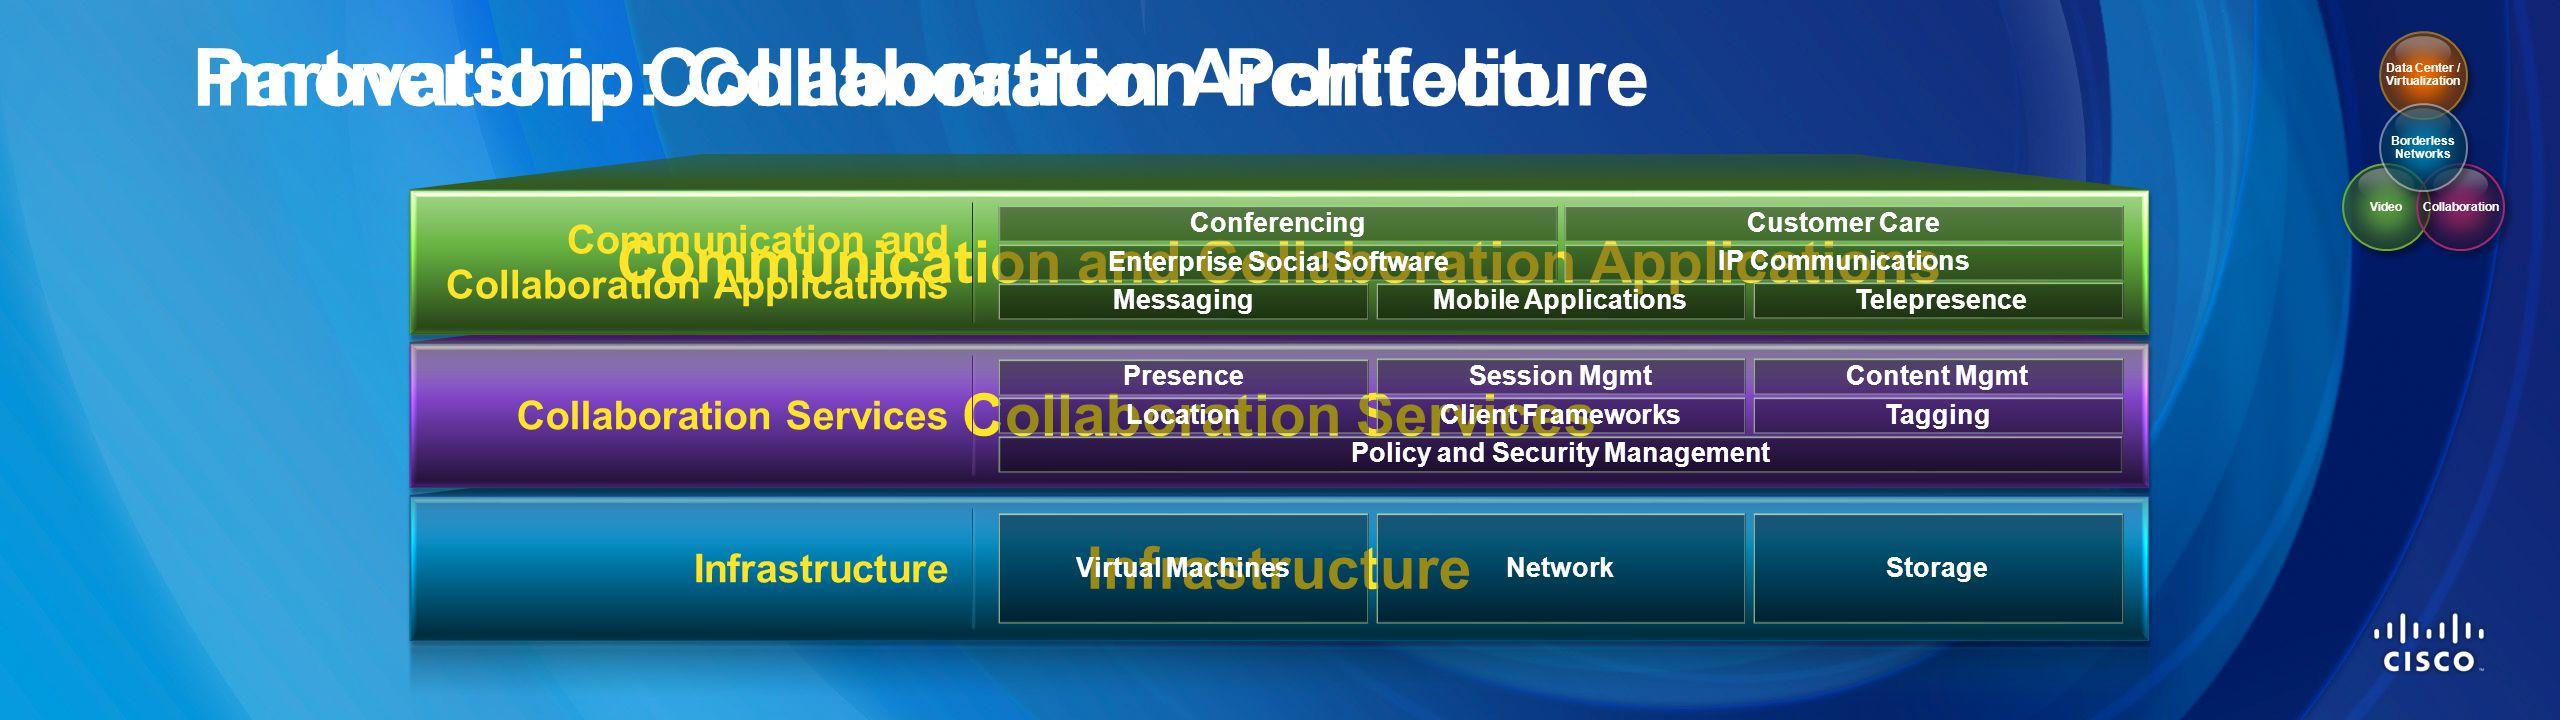 Transformation: Molina Healthcare Video Data Center / Virtualization Collaboration Borderless Networks